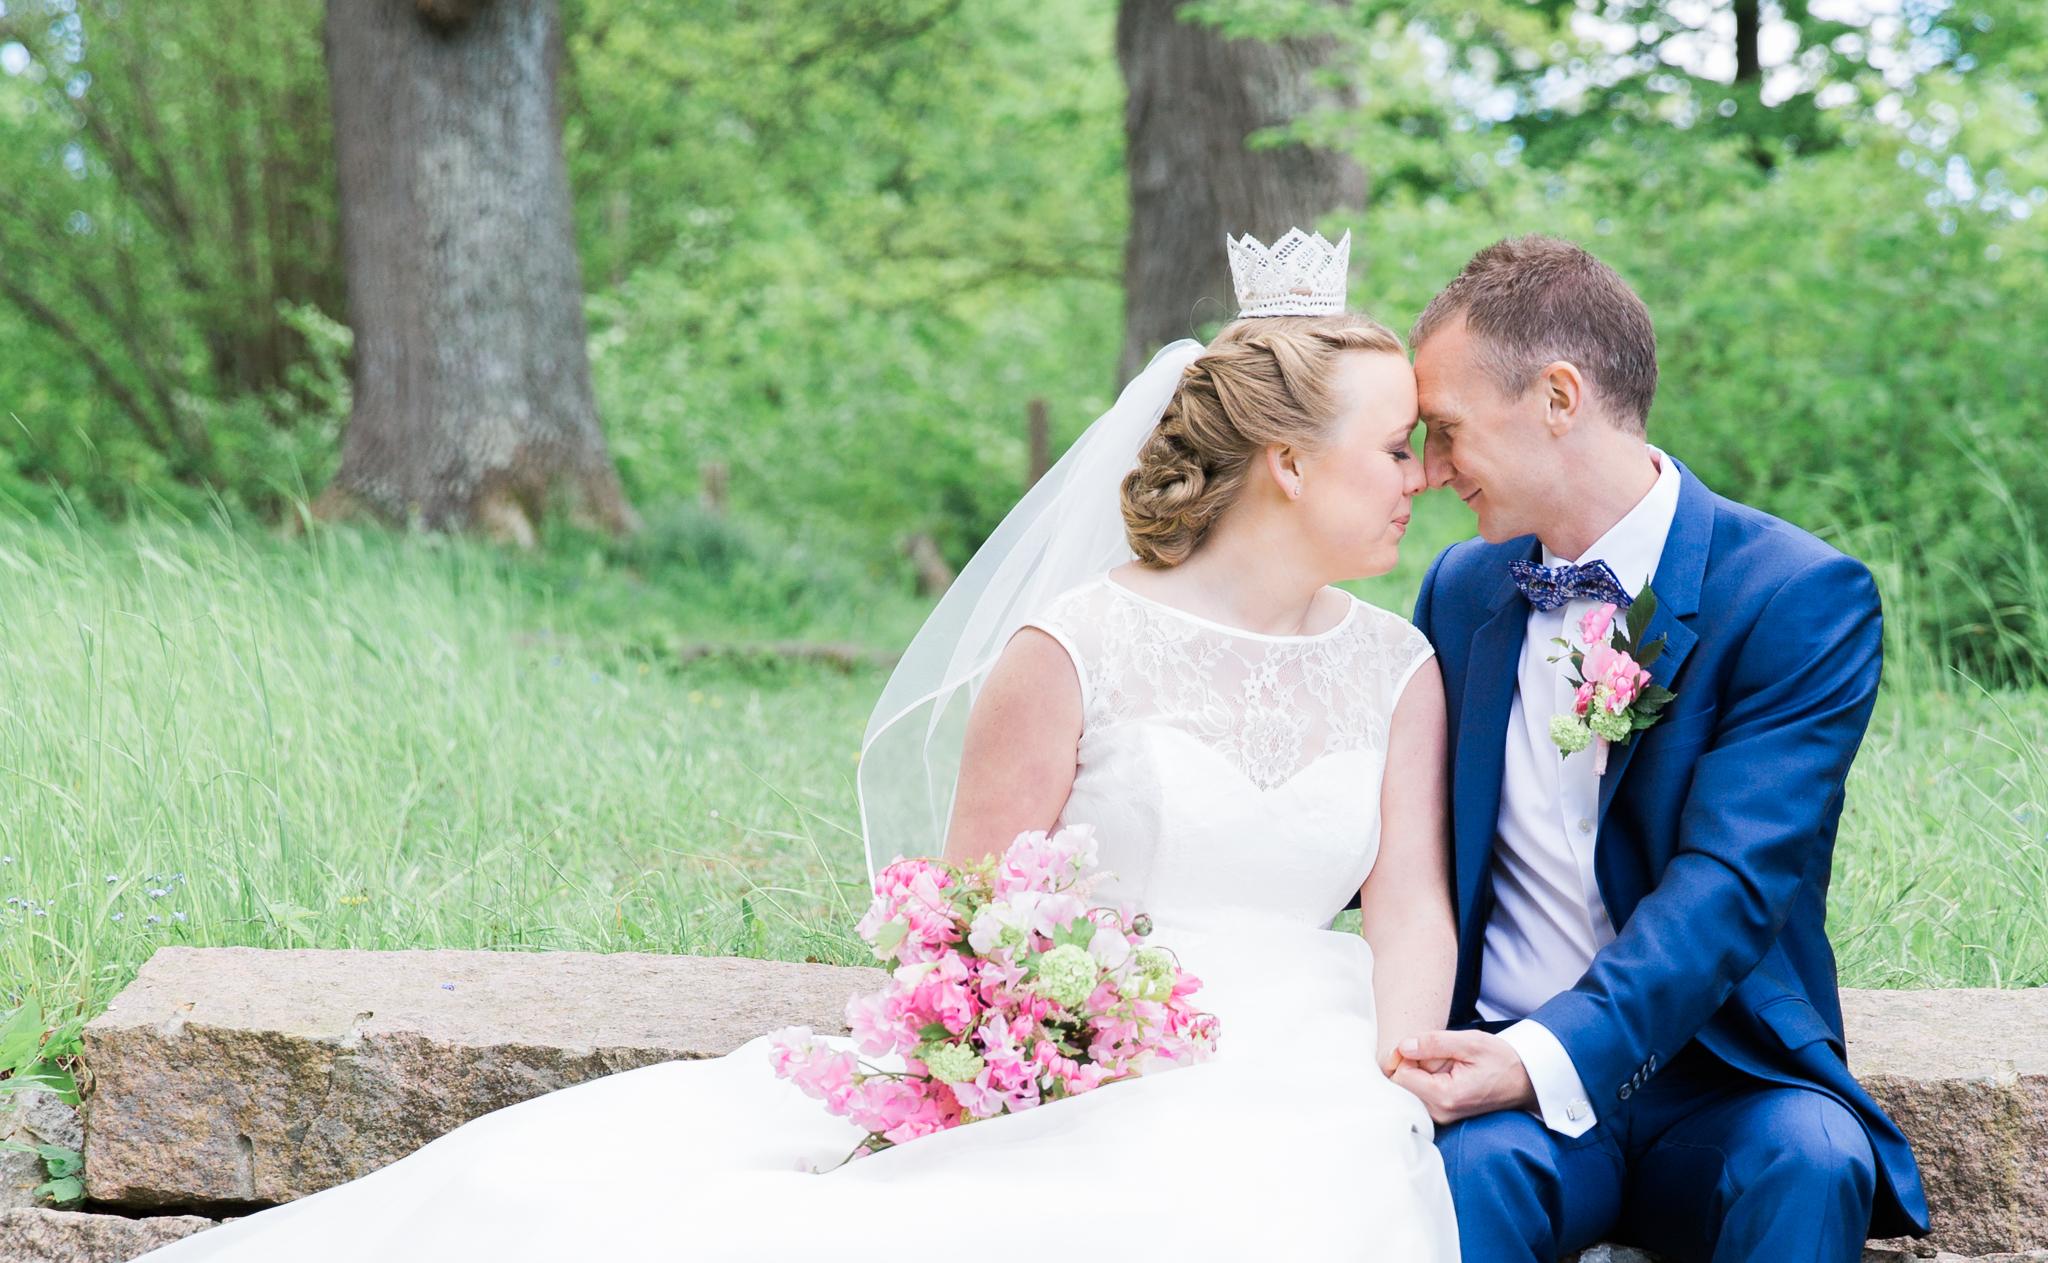 ViOli Photography bröllopsfotograf-Karlshamn-Blekinge-Ronneby-Karlskrona-Sölvesborg-Bromölla-Kristianstad (11 av 35)